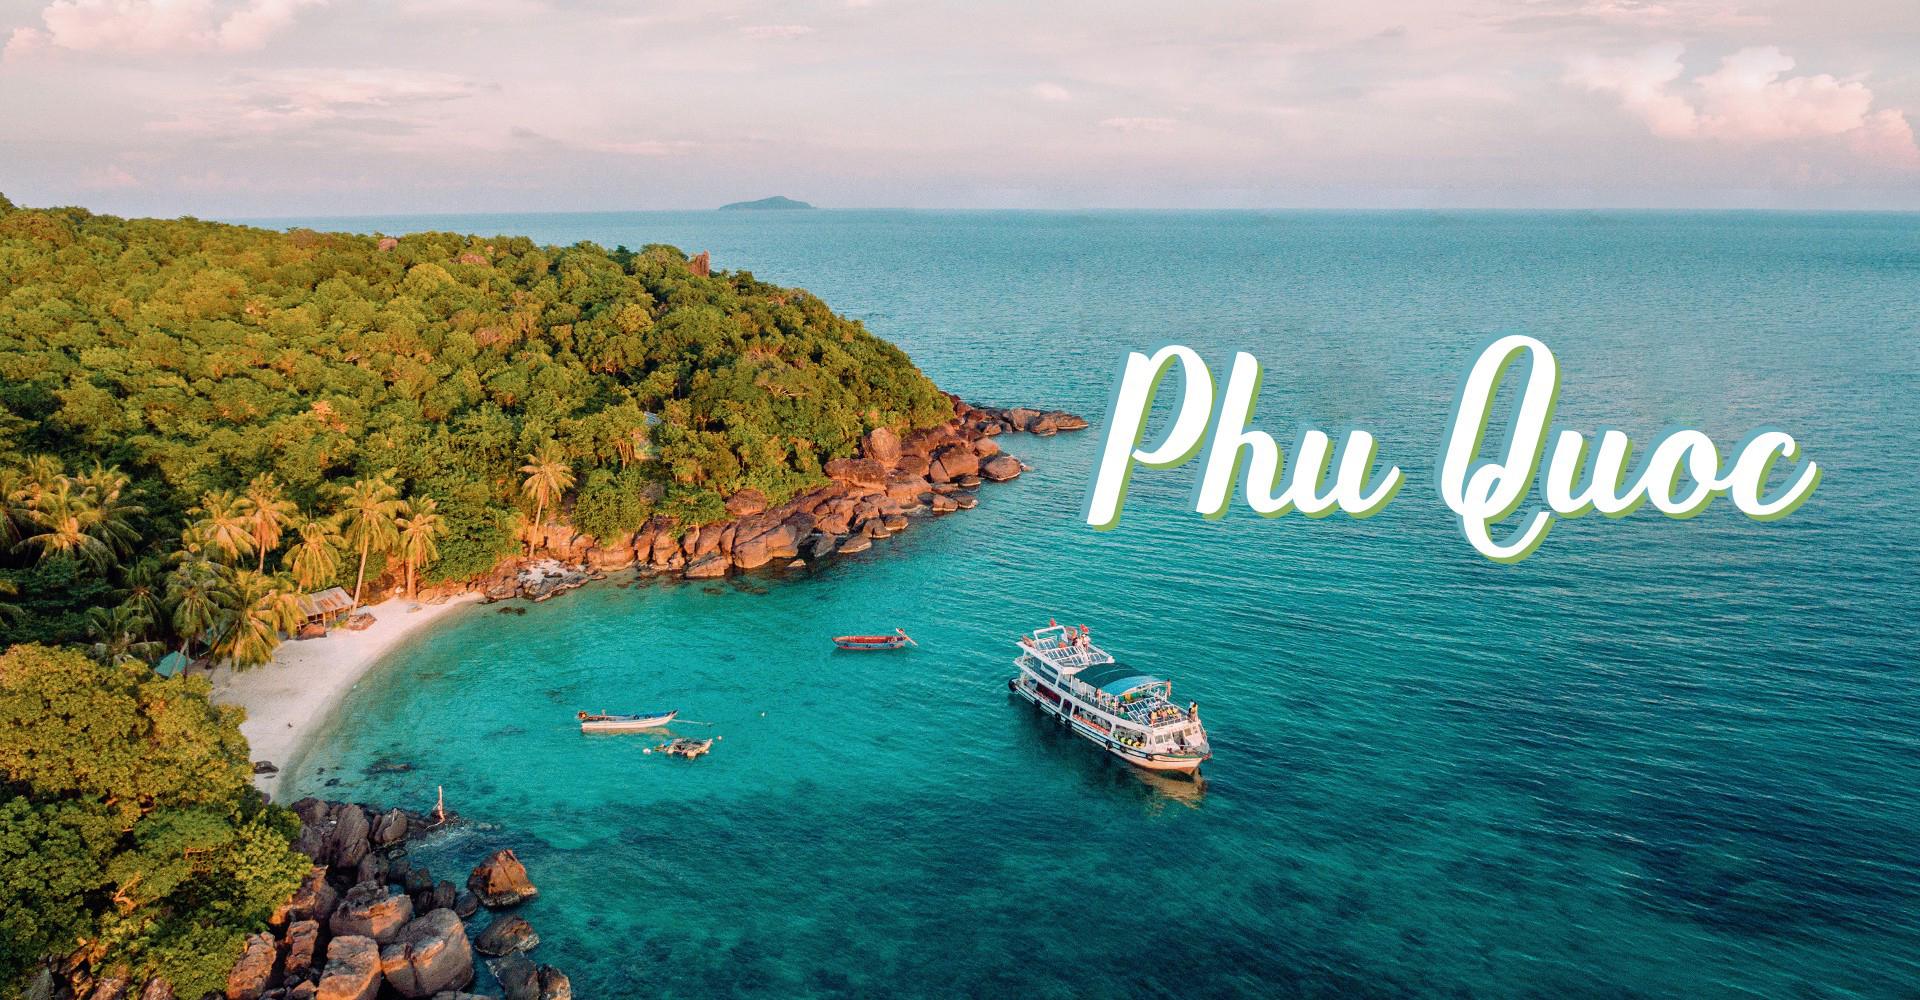 Fabulous Phu Quoc: Vietnam's island paradise